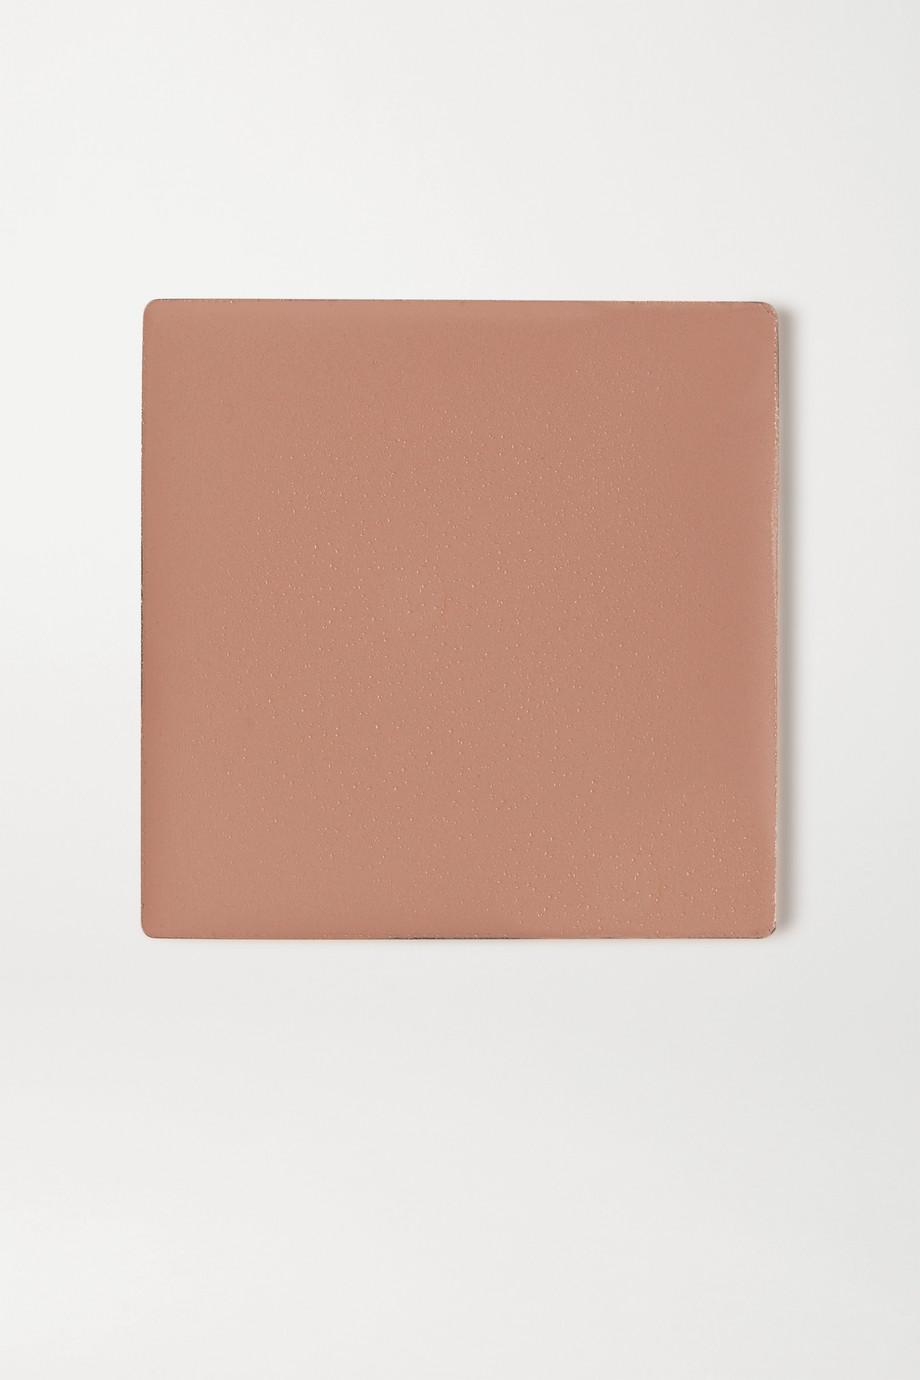 Kjaer Weis Cream Foundation Refill - Subtlety